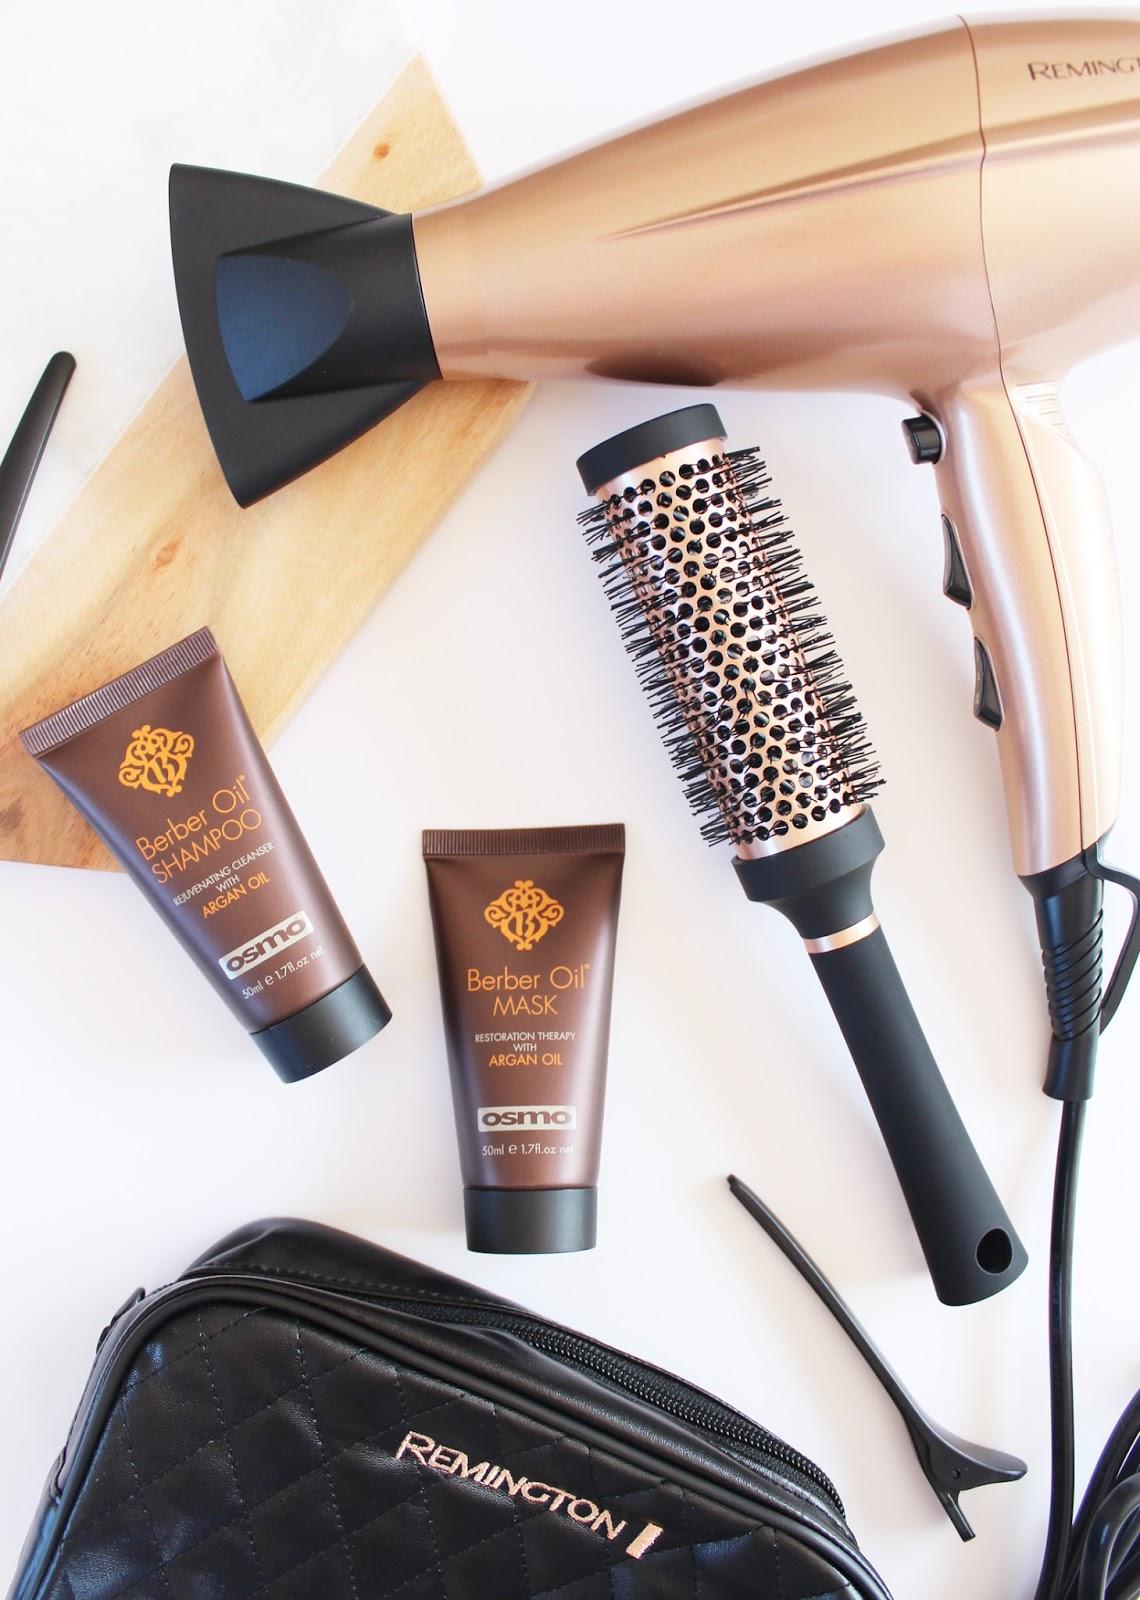 REMINGTON | Shine Revival Hair Dryer Review - CassandraMyee